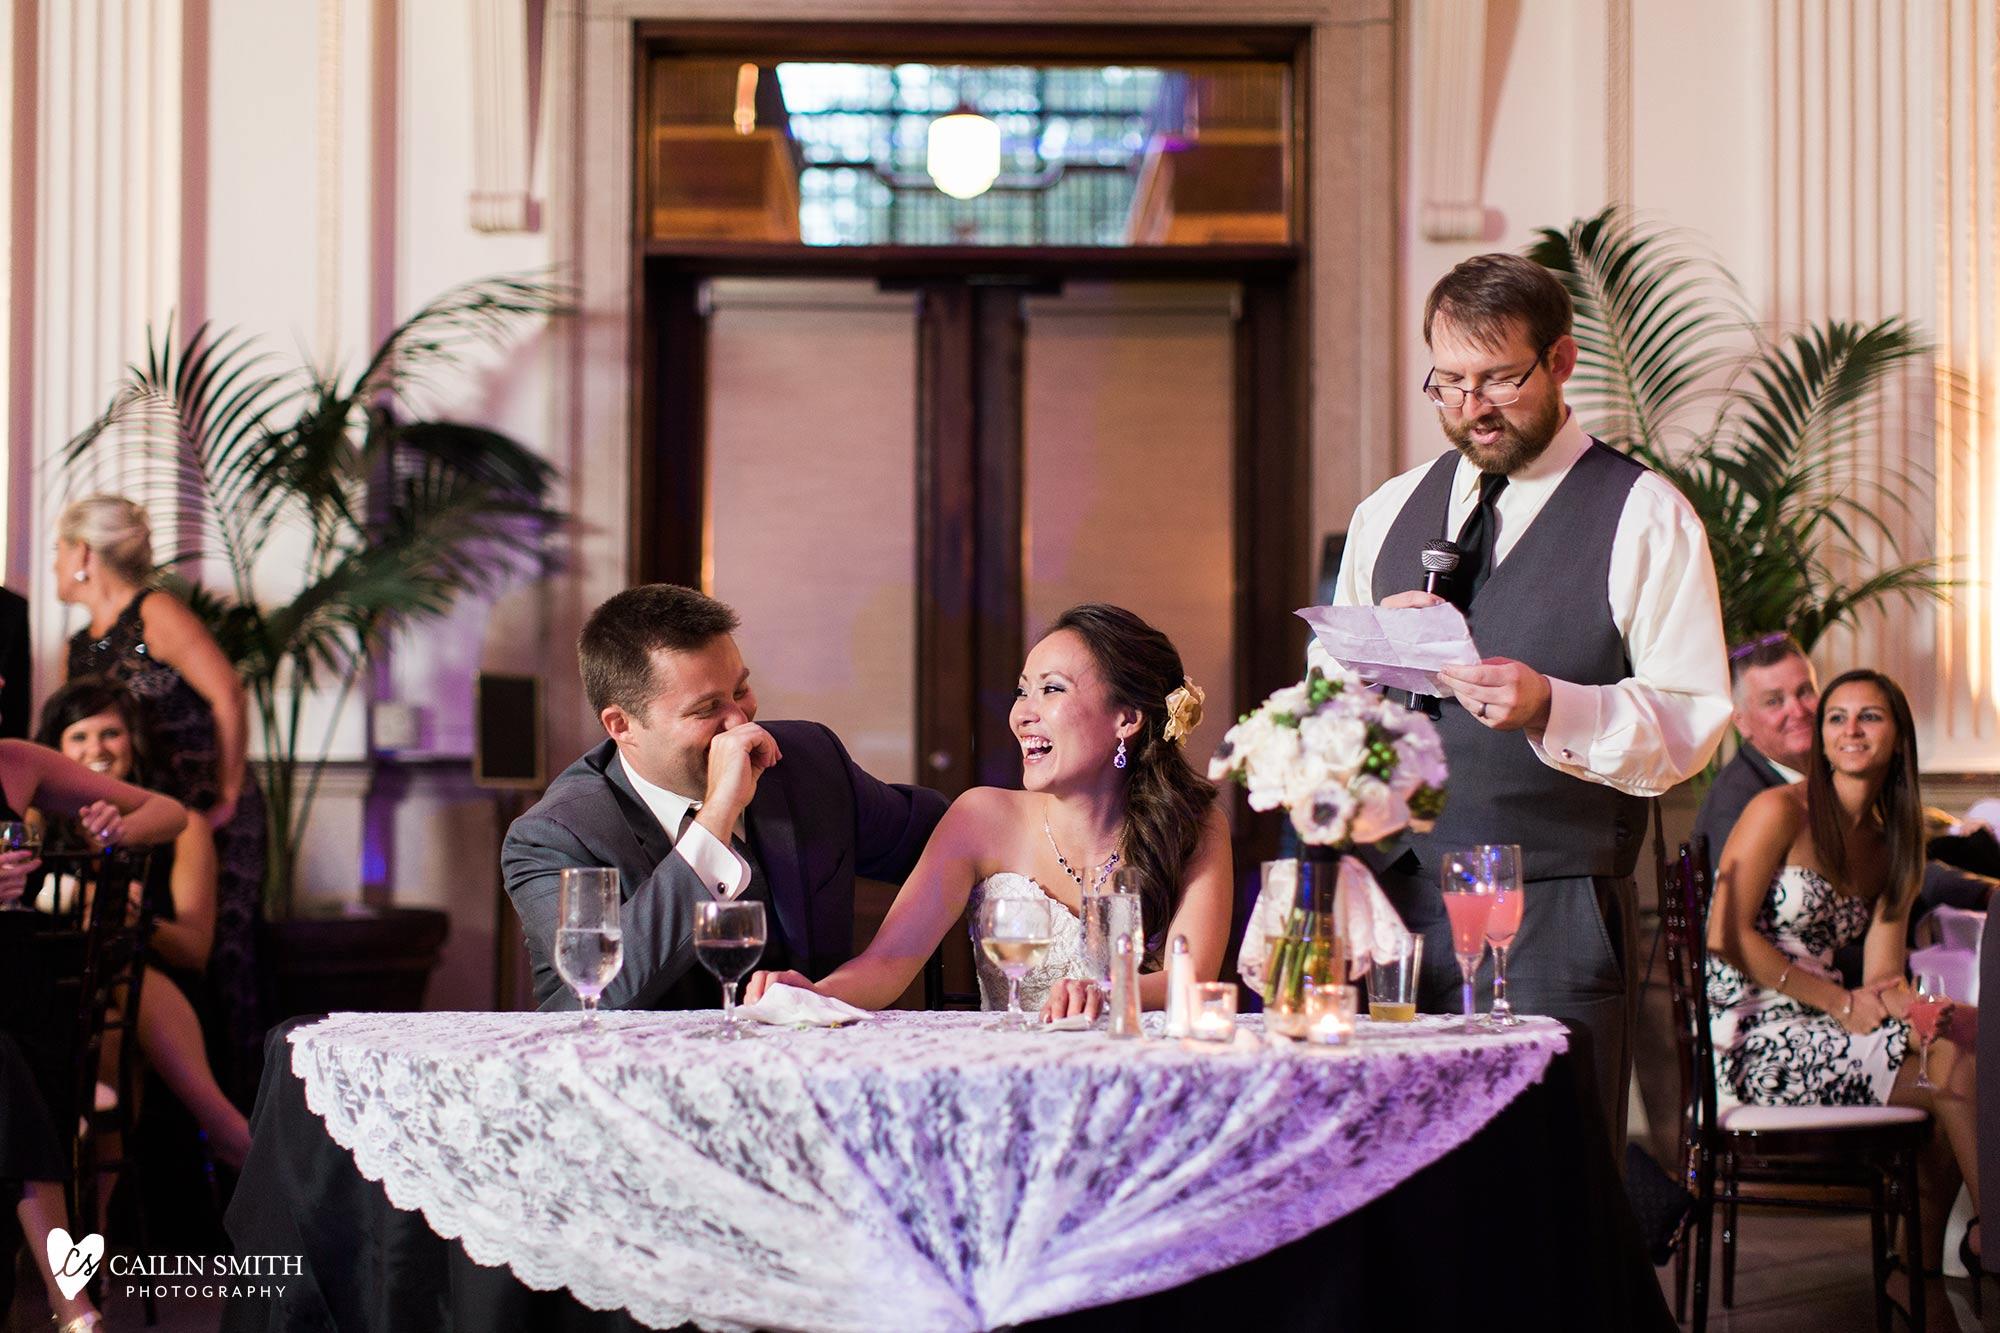 Jenifer_Dewey_Treasury_on_The_Plaza_Wedding_Photography_084.jpg